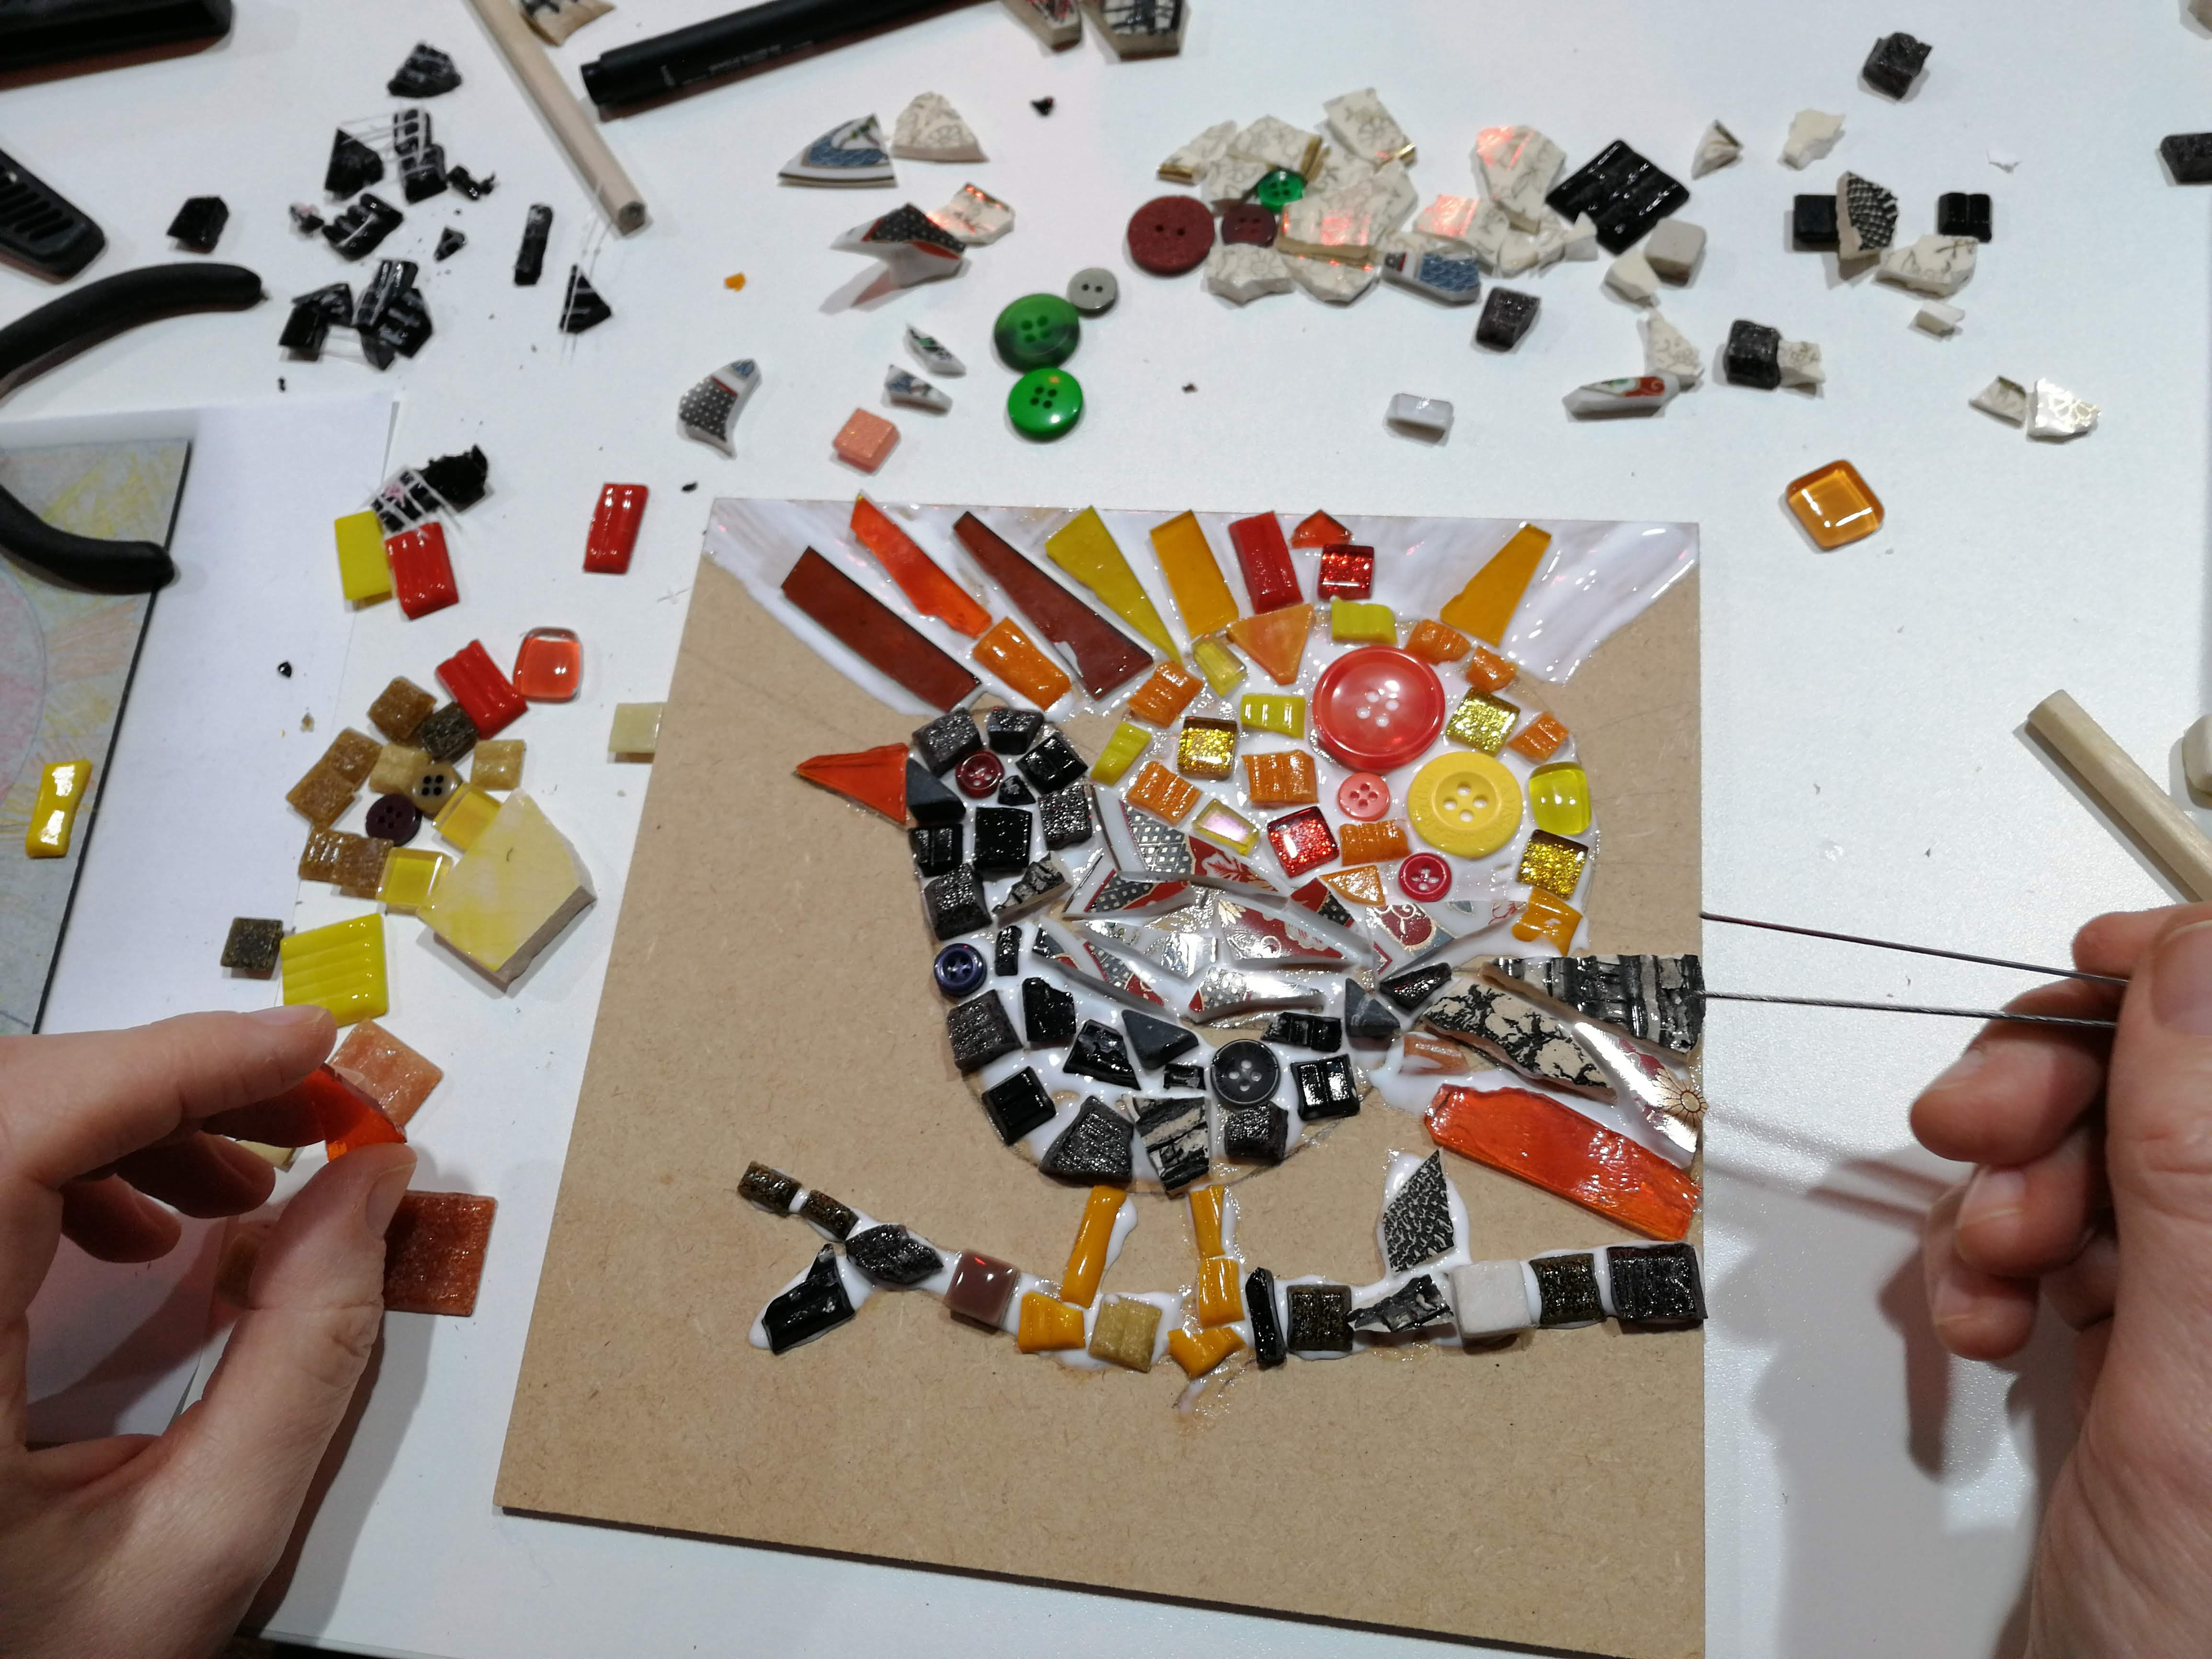 Creative Mosaic Workshop - EJR